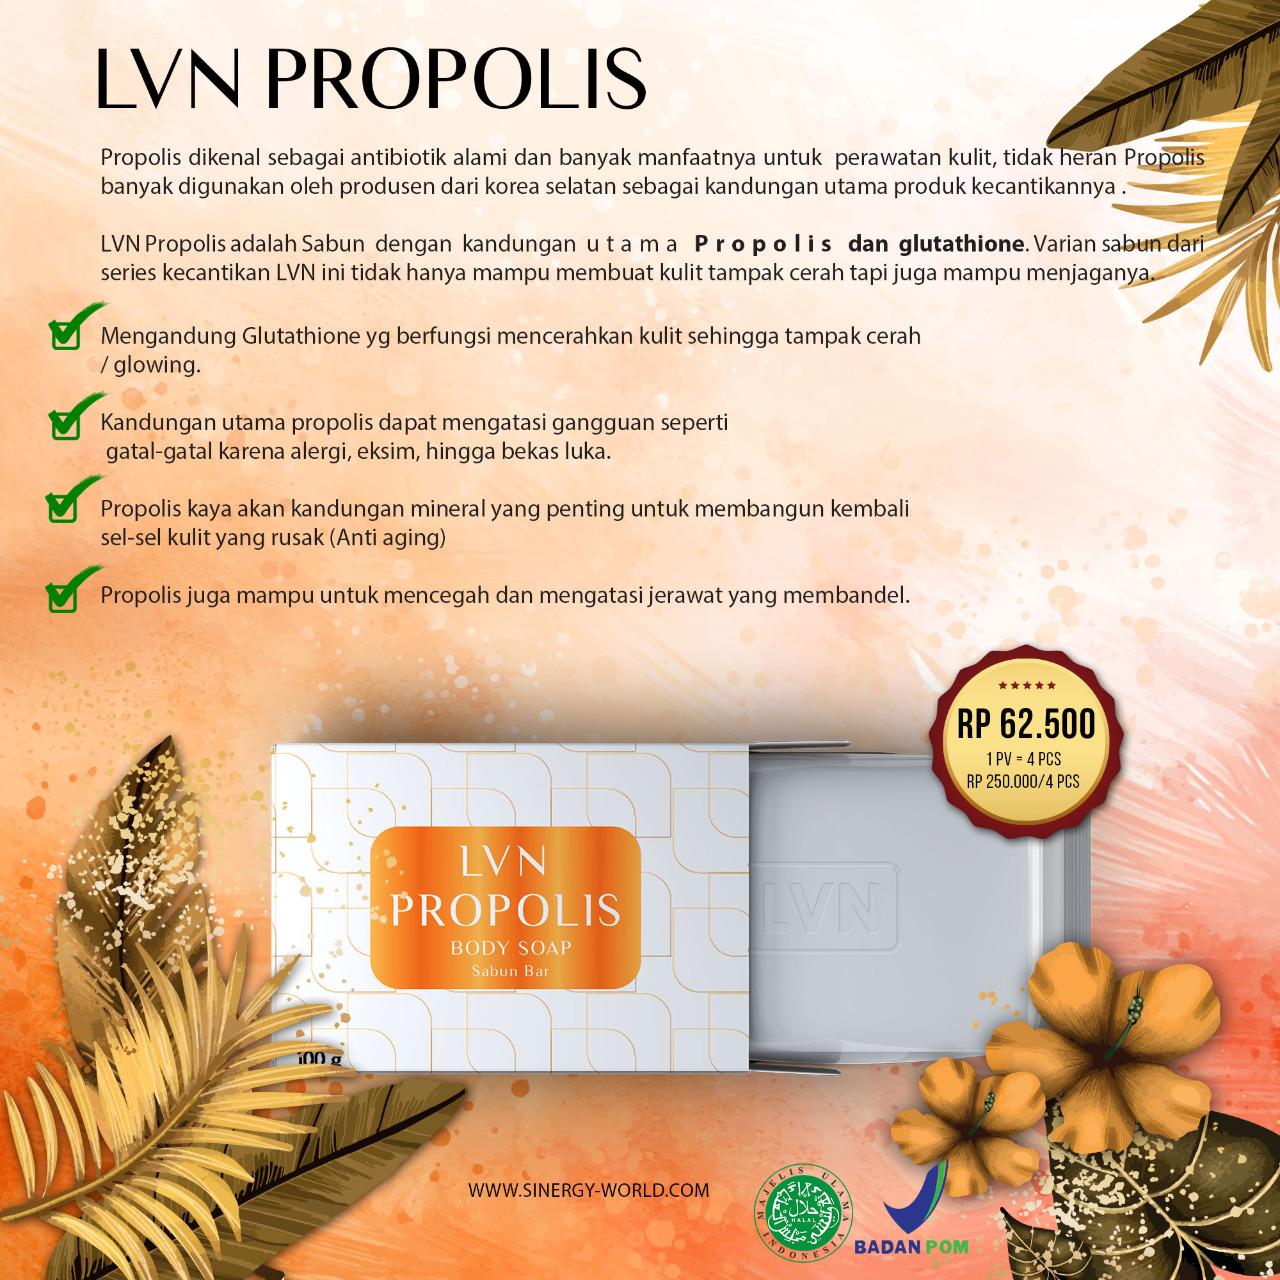 LVN PROPOLIS